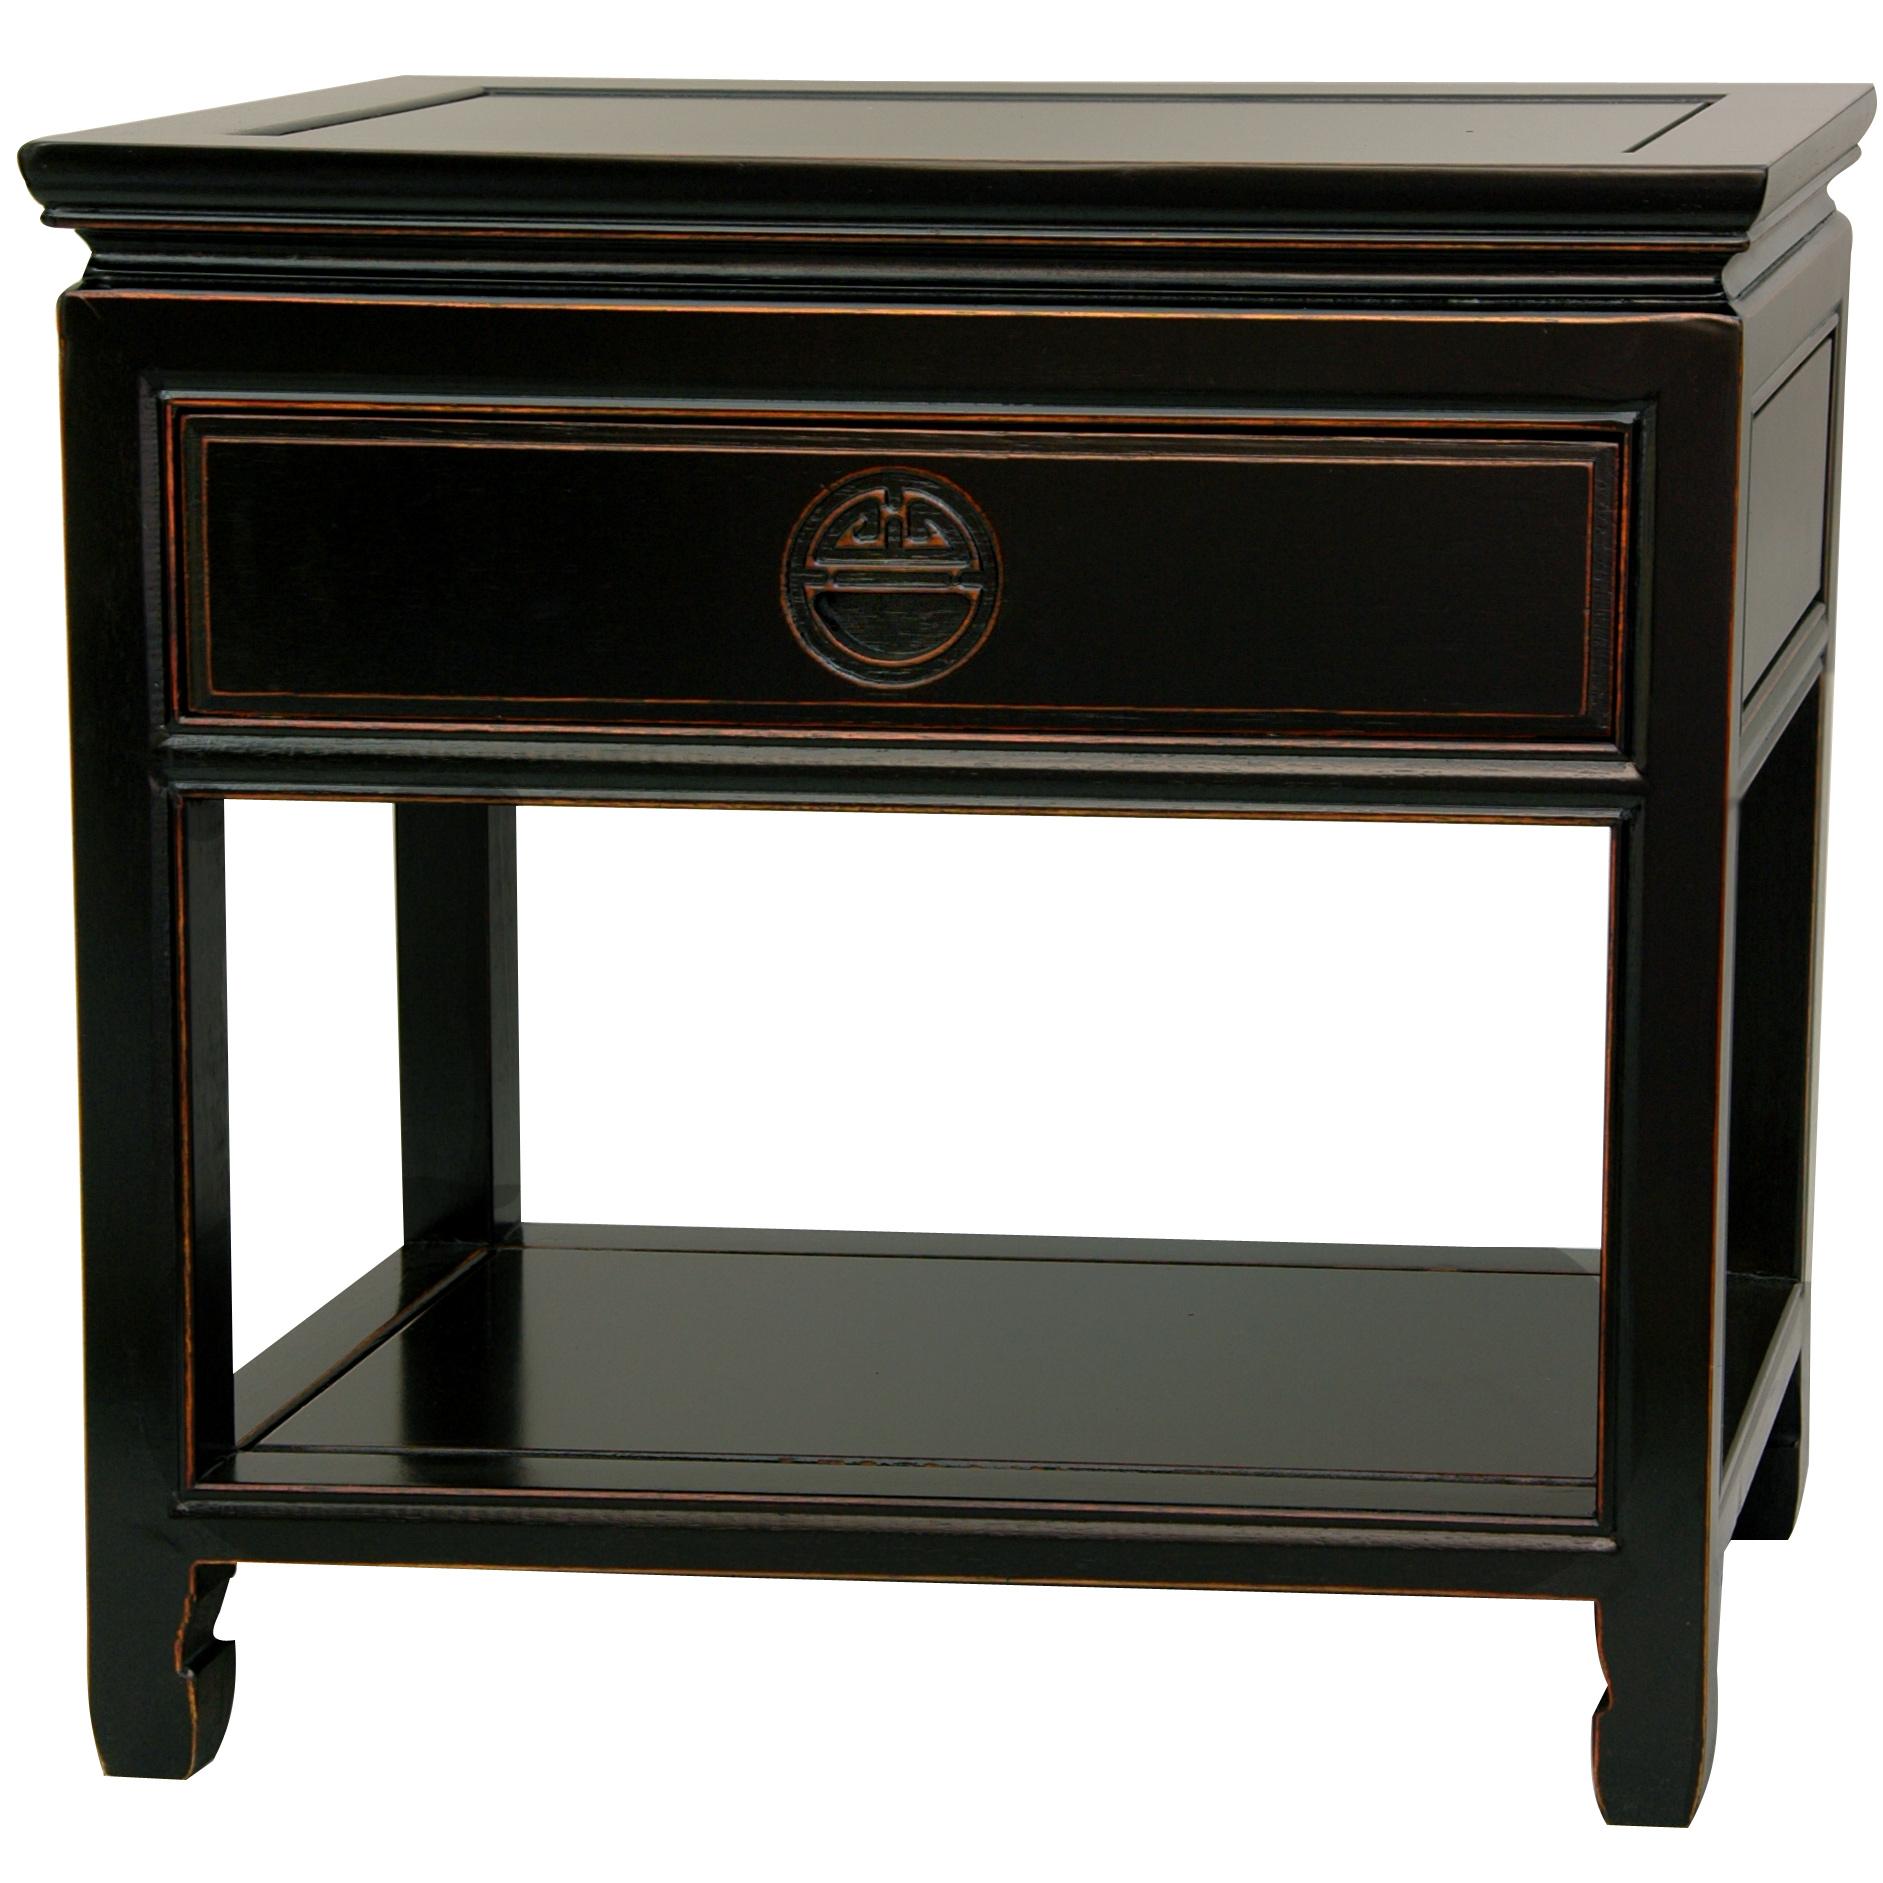 Details About Oriental Furniture Rosewood Bedside Table Antique Black